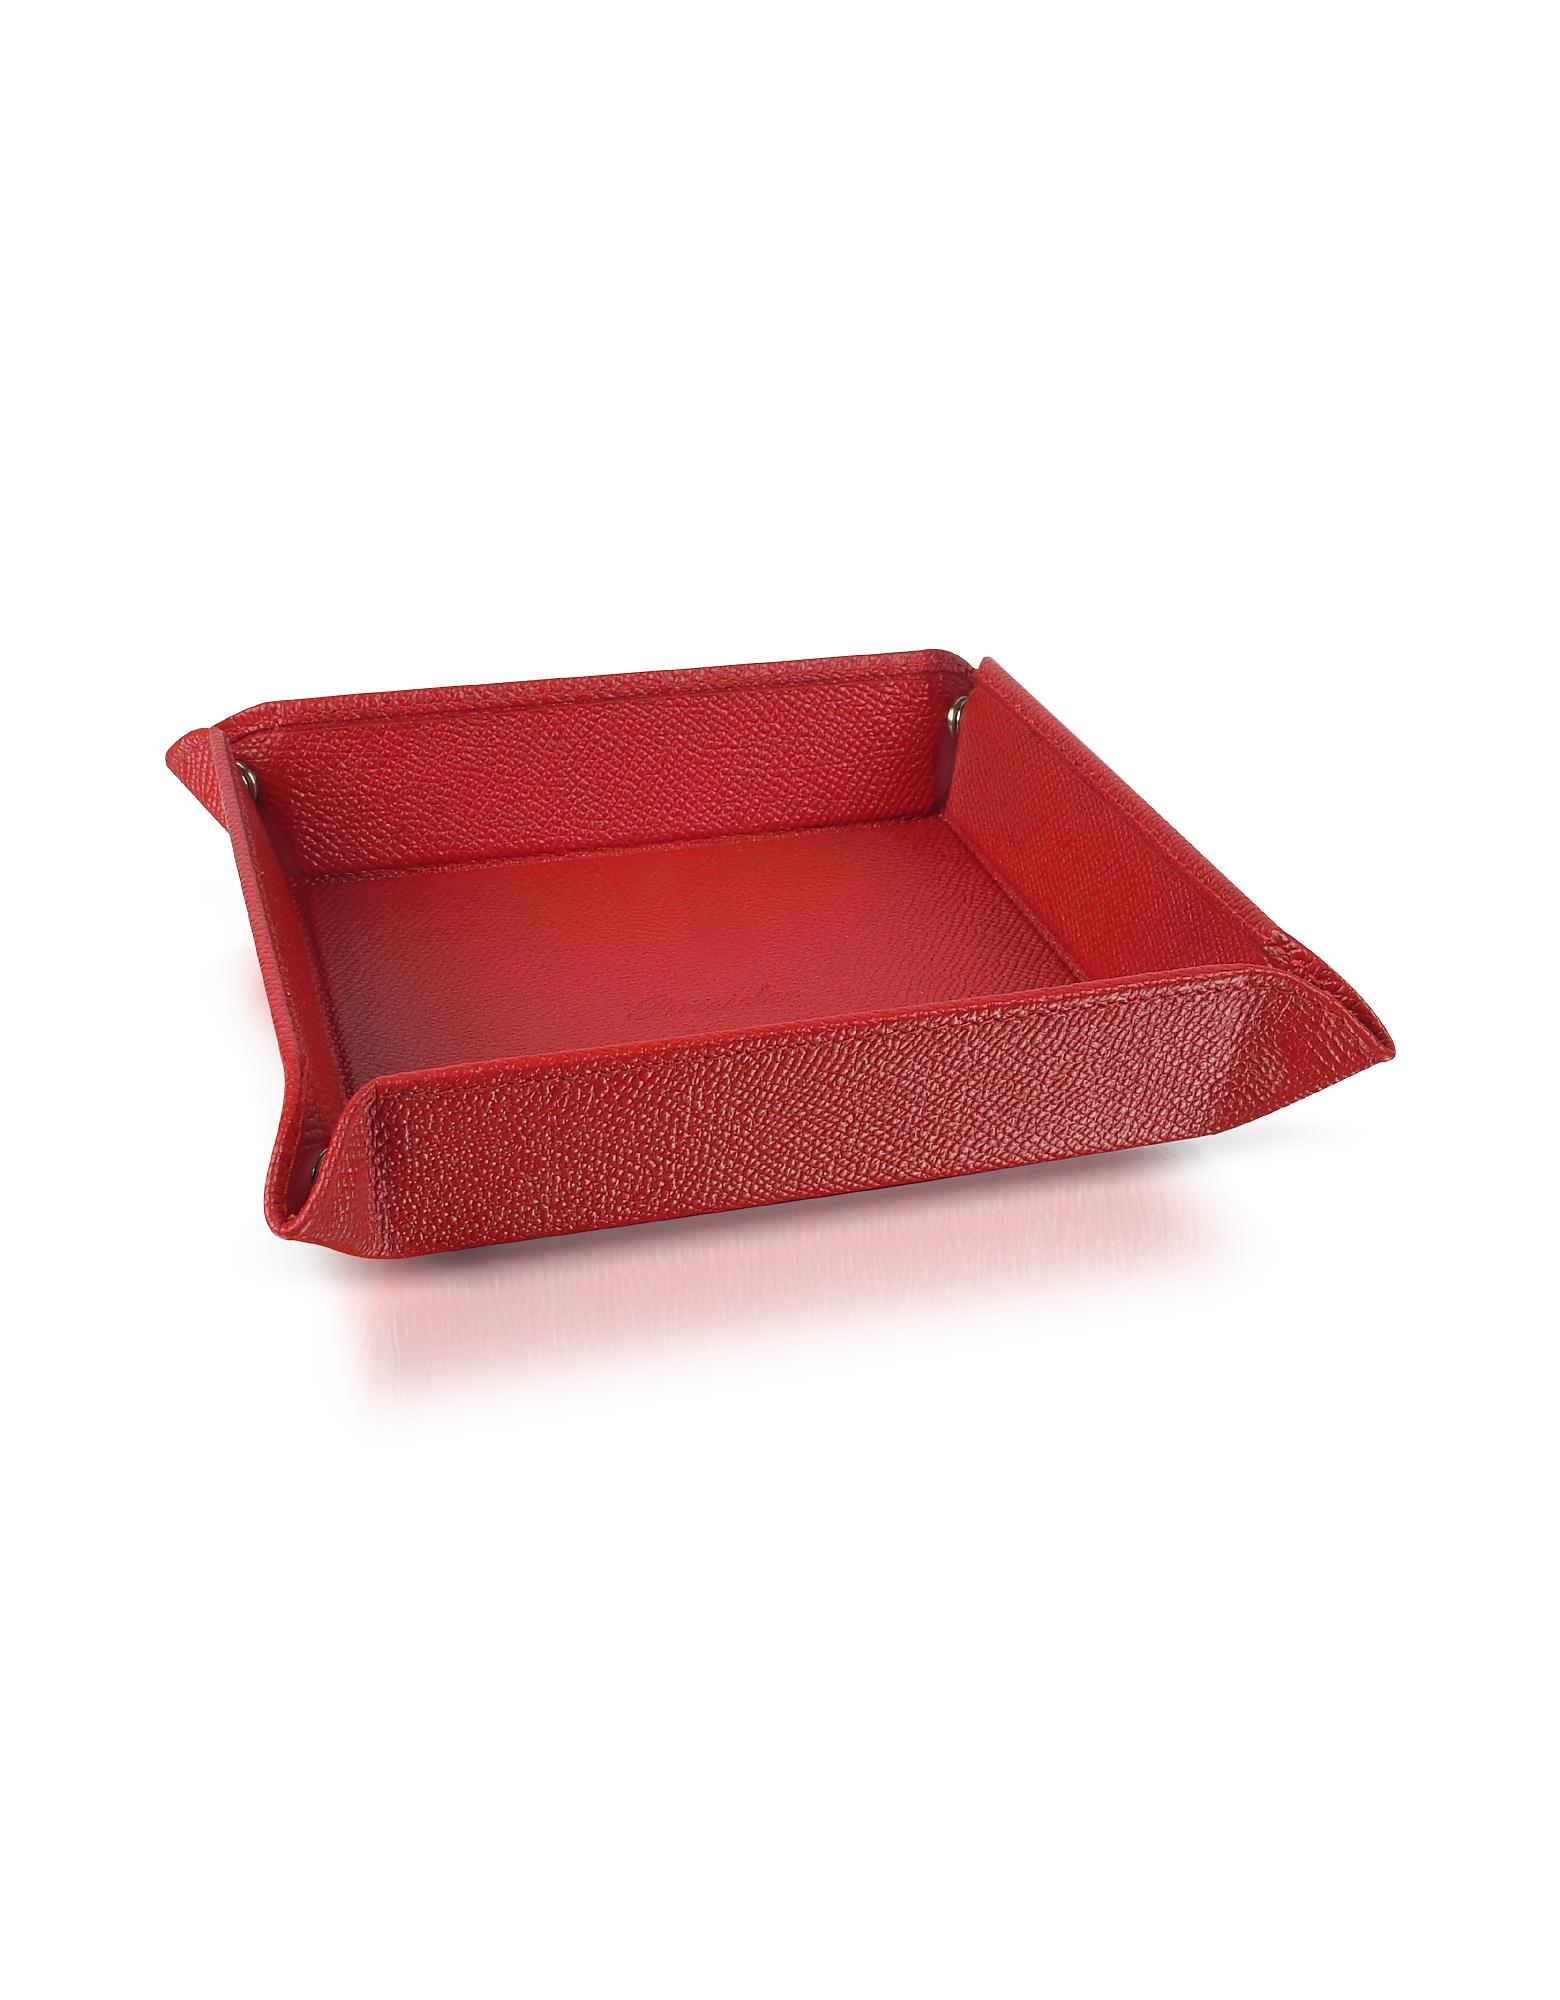 Pineider Small Leather Goods, City Chic - Calfskin Square Medium Valet Tray